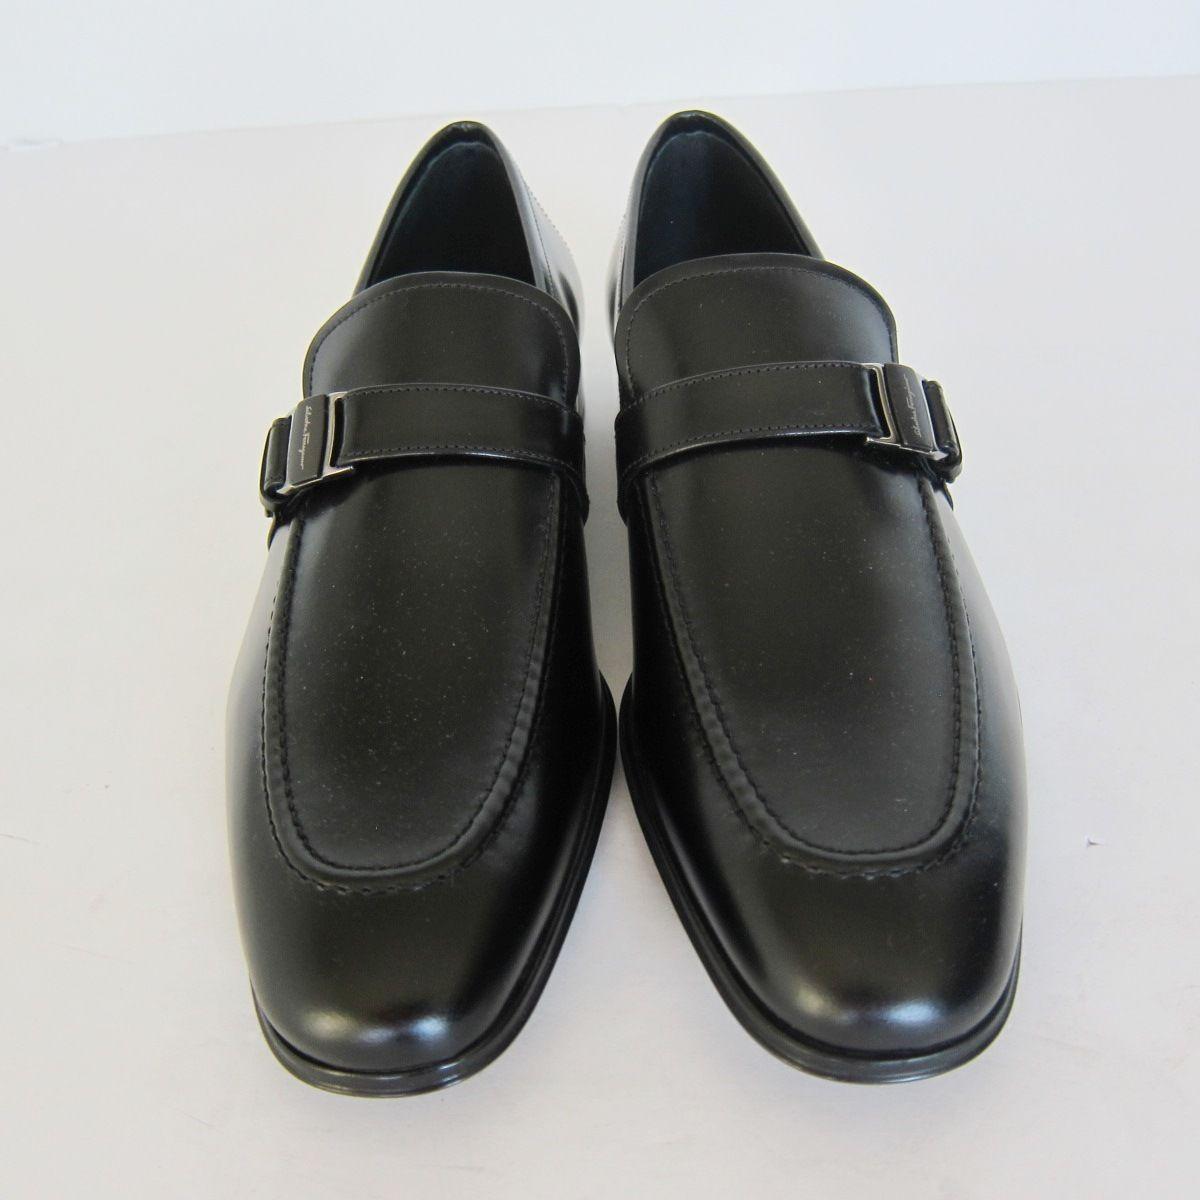 3f720e2531f Y-1732208 New Salvatore Ferragamo Pinot Black Leather Loafer Shoe Size US  8.5D